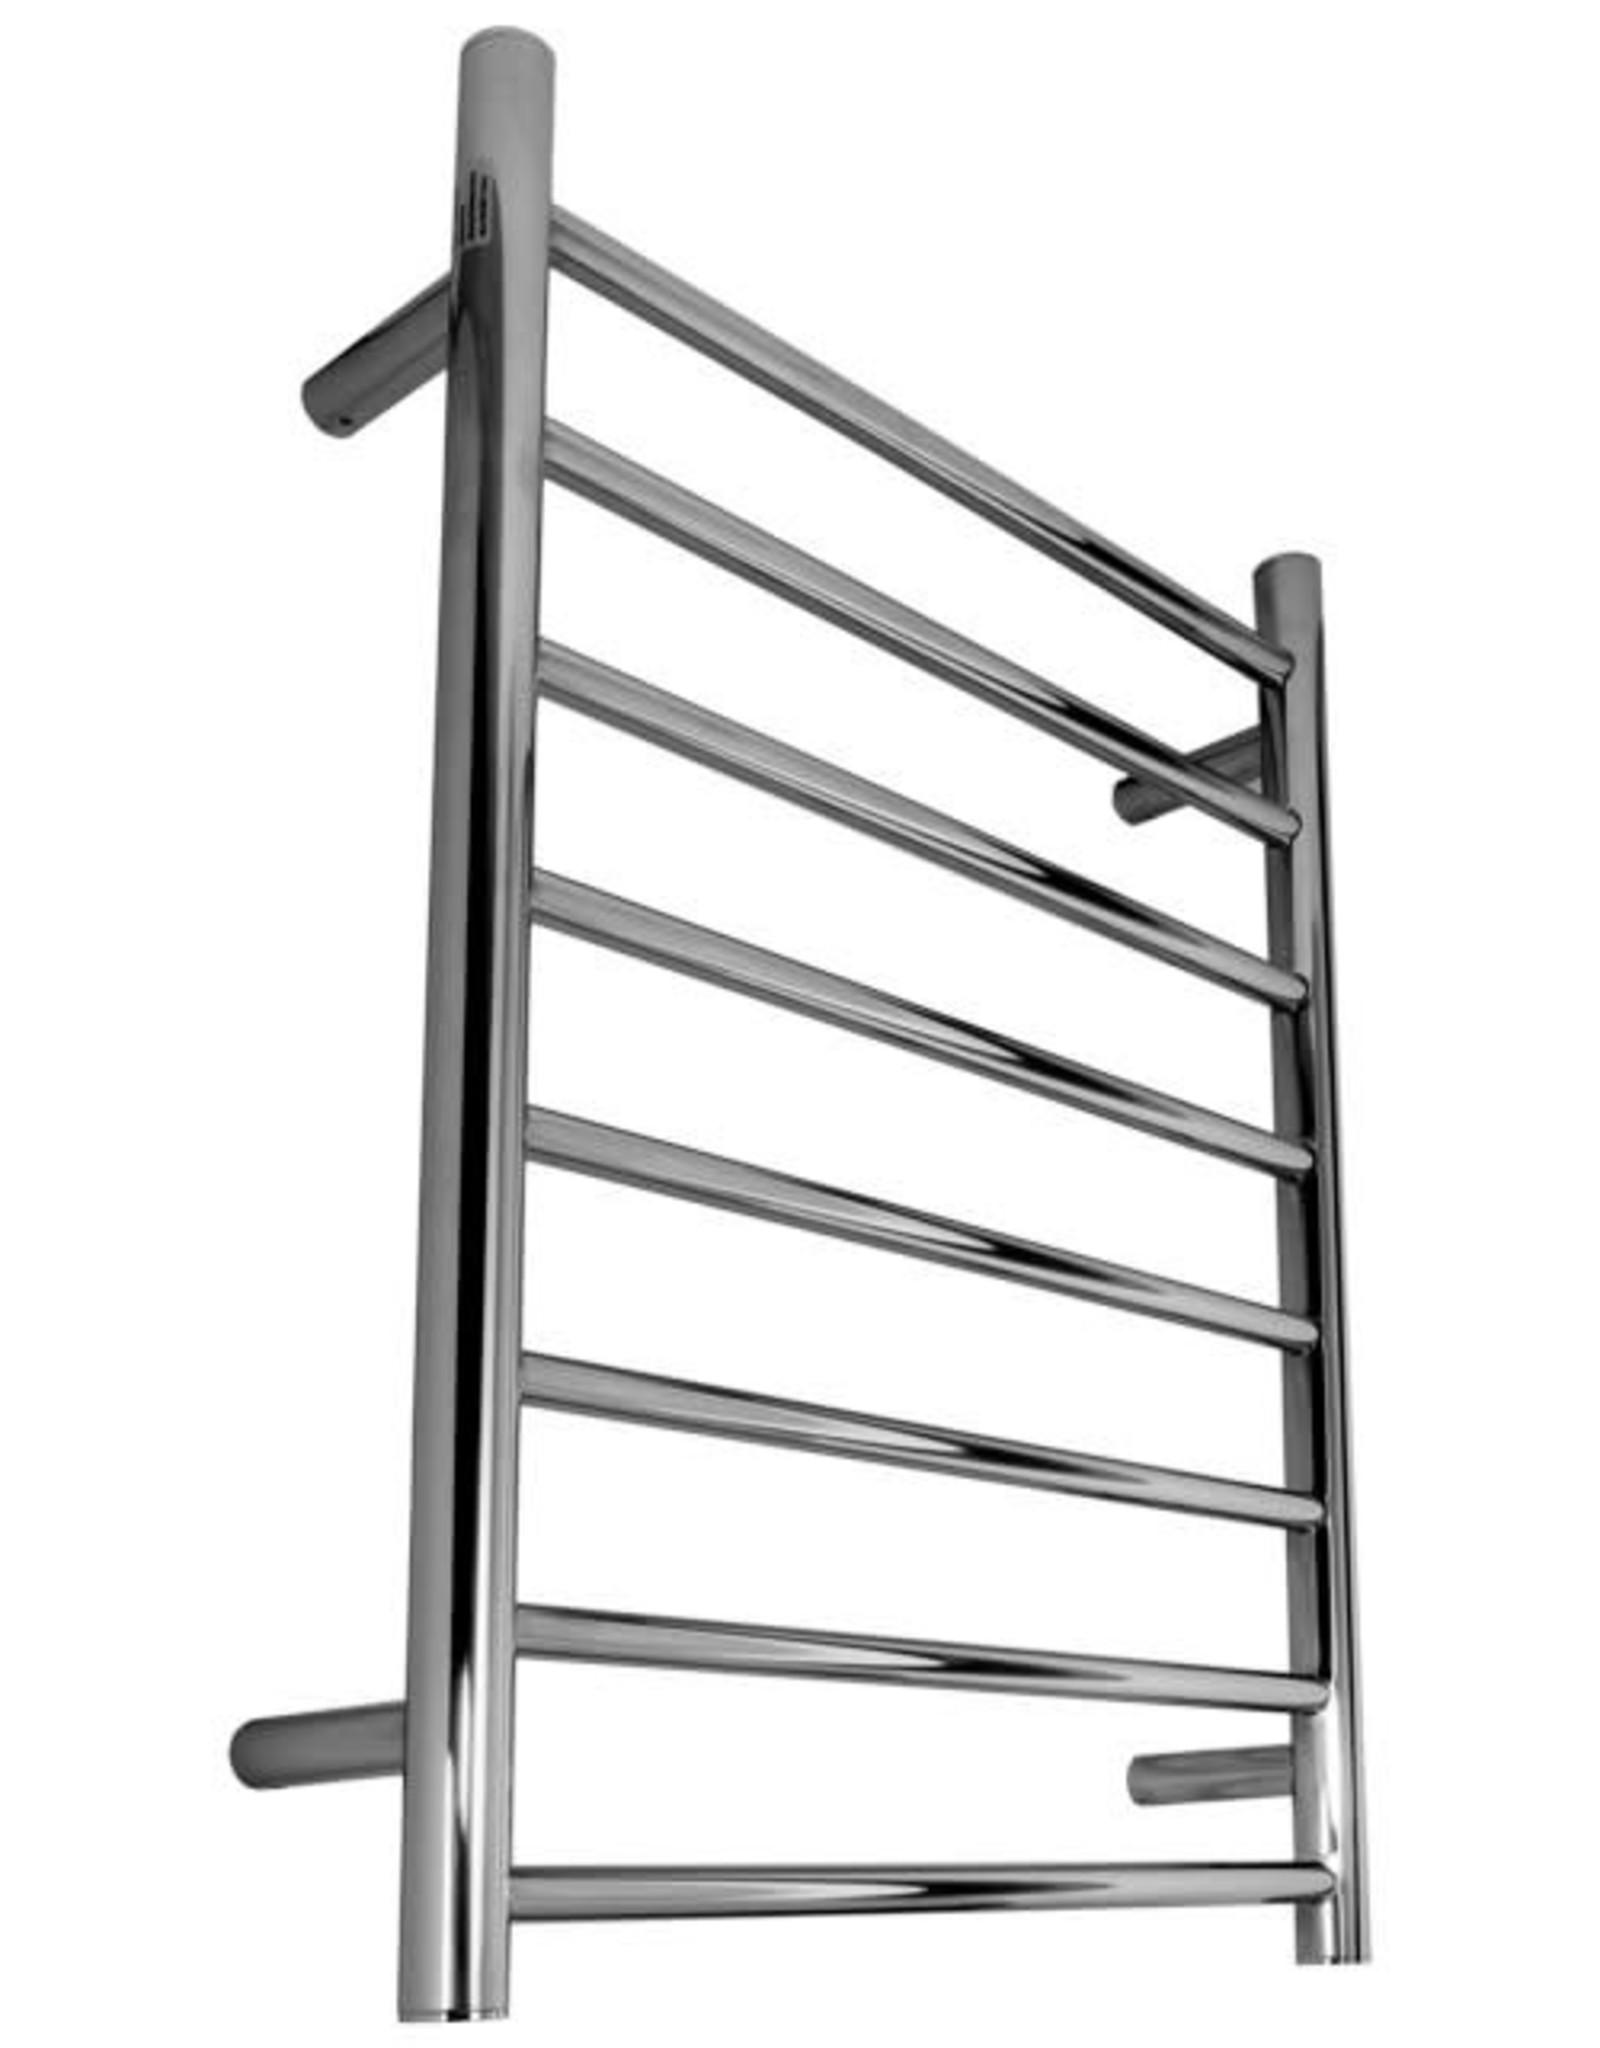 LalOO Laloo 4800R Towel Ladder- Chrome